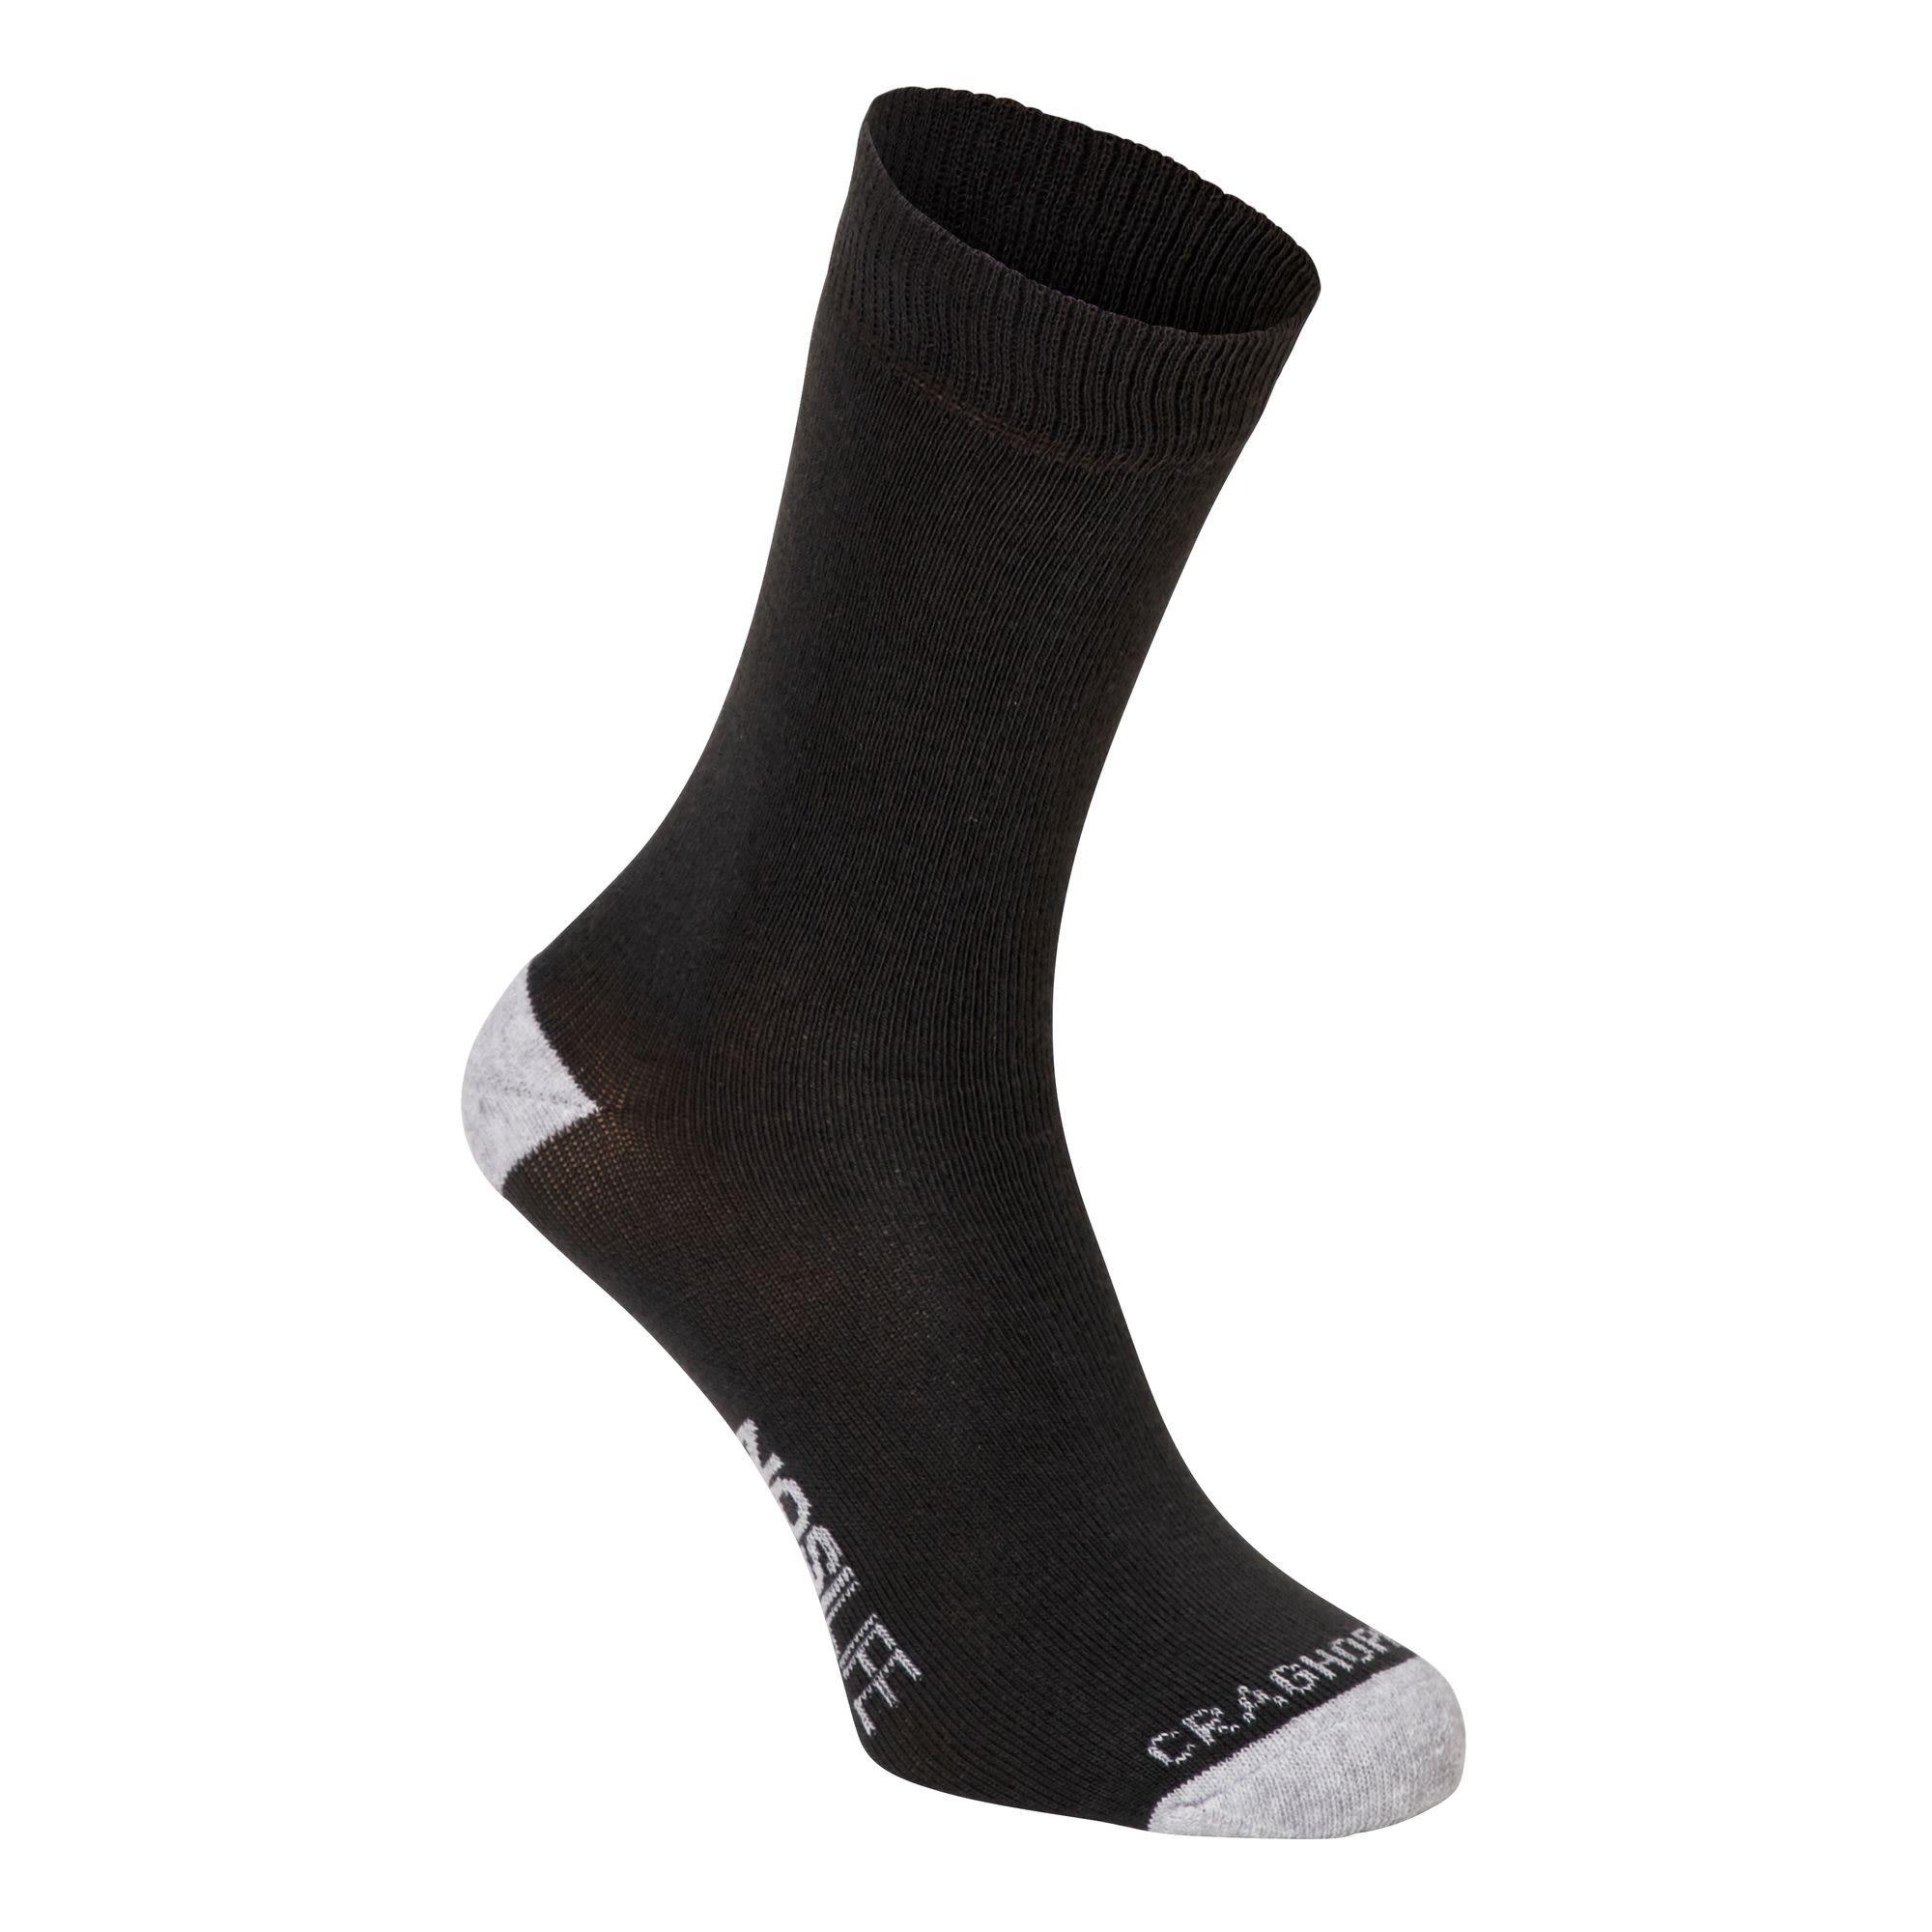 Craghoppers Single Nosilife Travel Socke Grau, Socken, EU 39-42 -UK 6-8